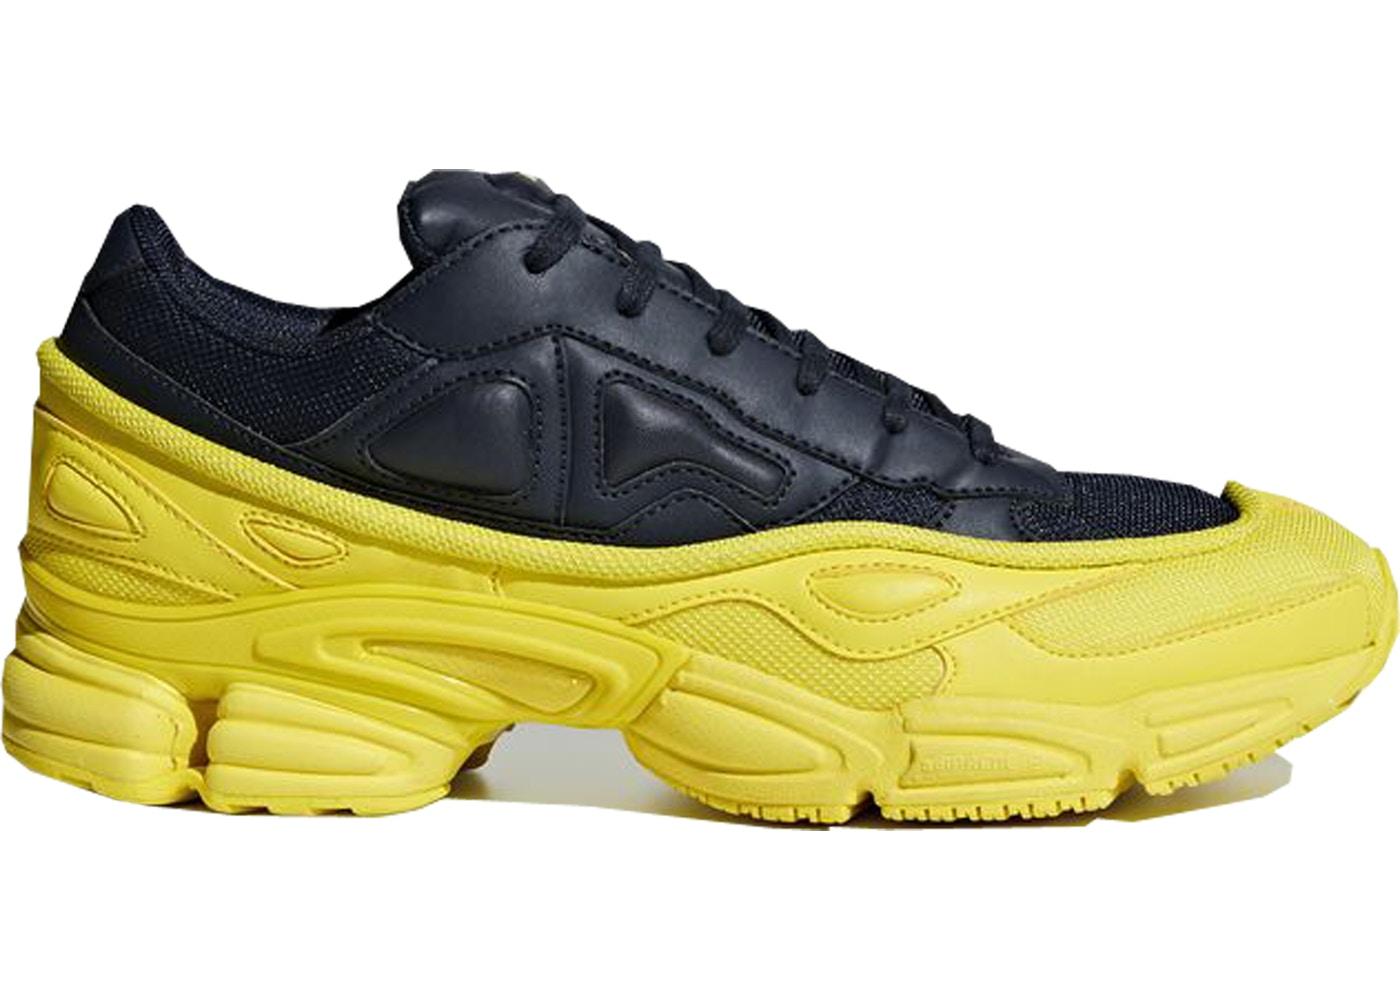 on sale b7d9c 07620 Adidas x Raf Simons Ozweego Bright Yellow / Night Navy